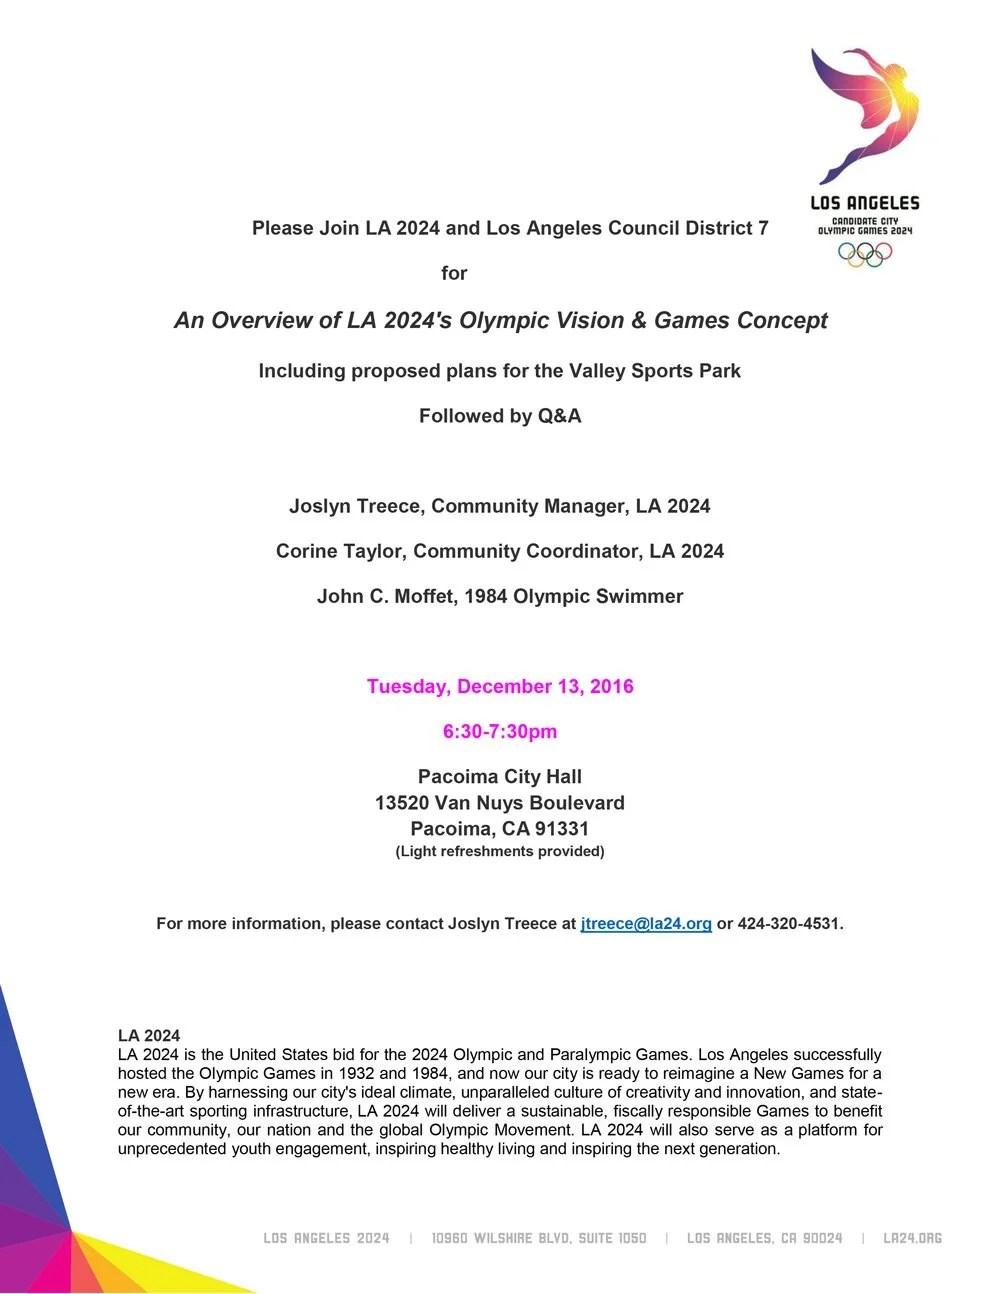 la24-cd7-olympicspresentationflyer-20161213